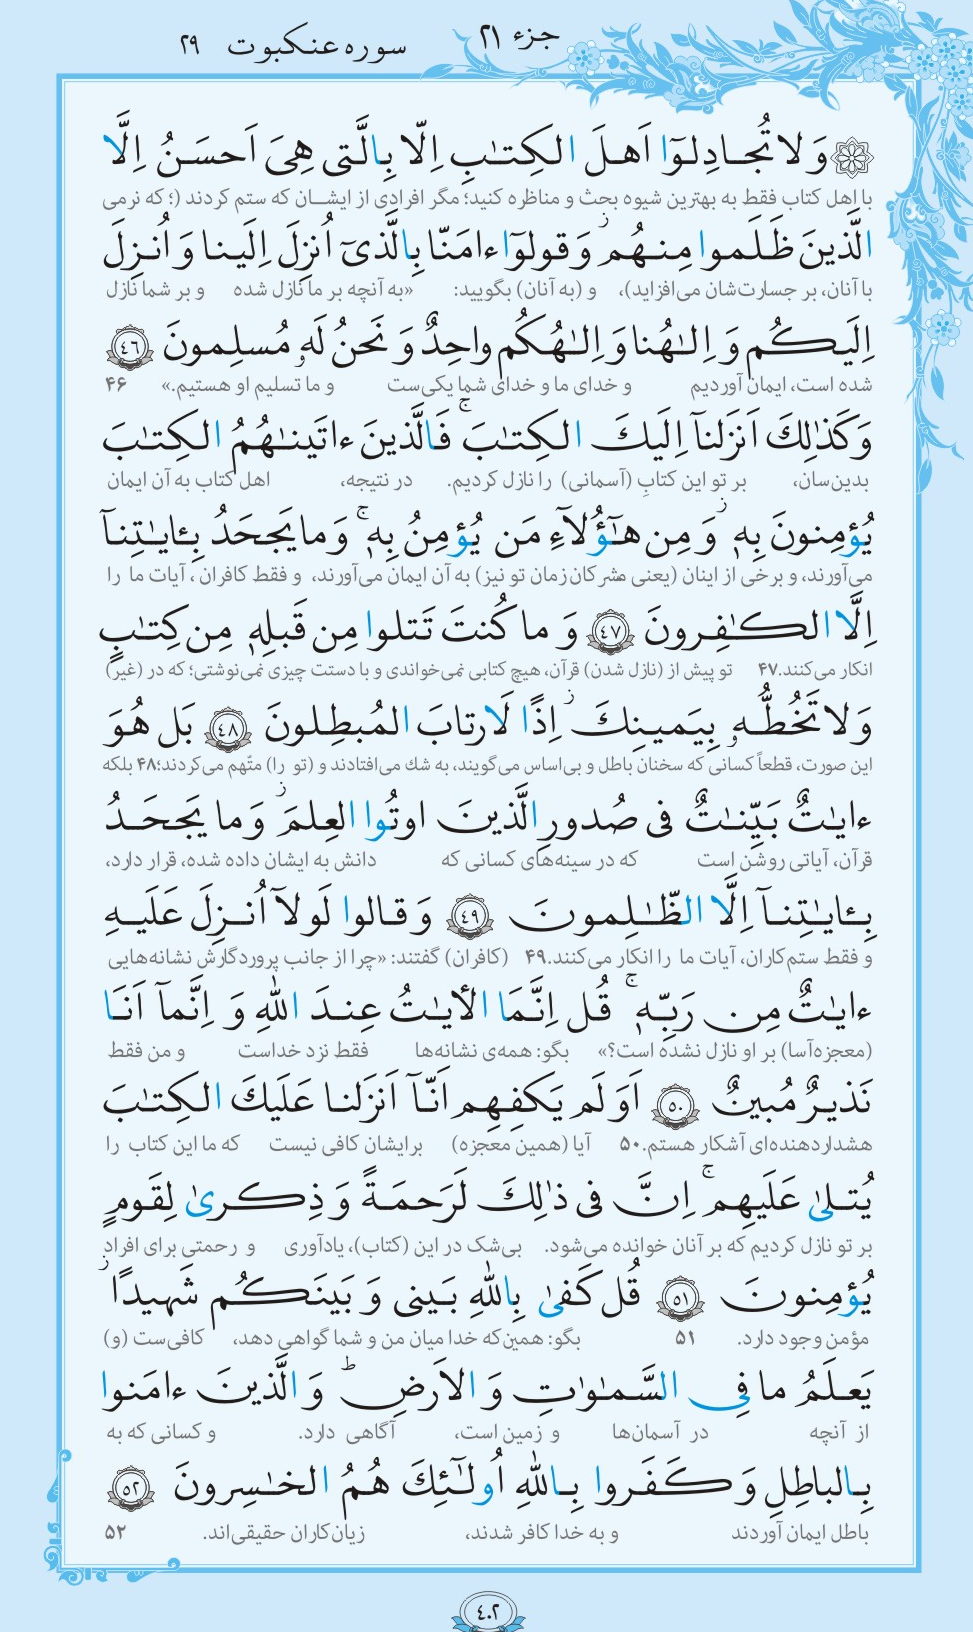 13990404000961 Test NewPhotoFree - ترتیل صفحه ۴۰۲ قرآن باصدای خلیل الحصری+صوت و متن آیات